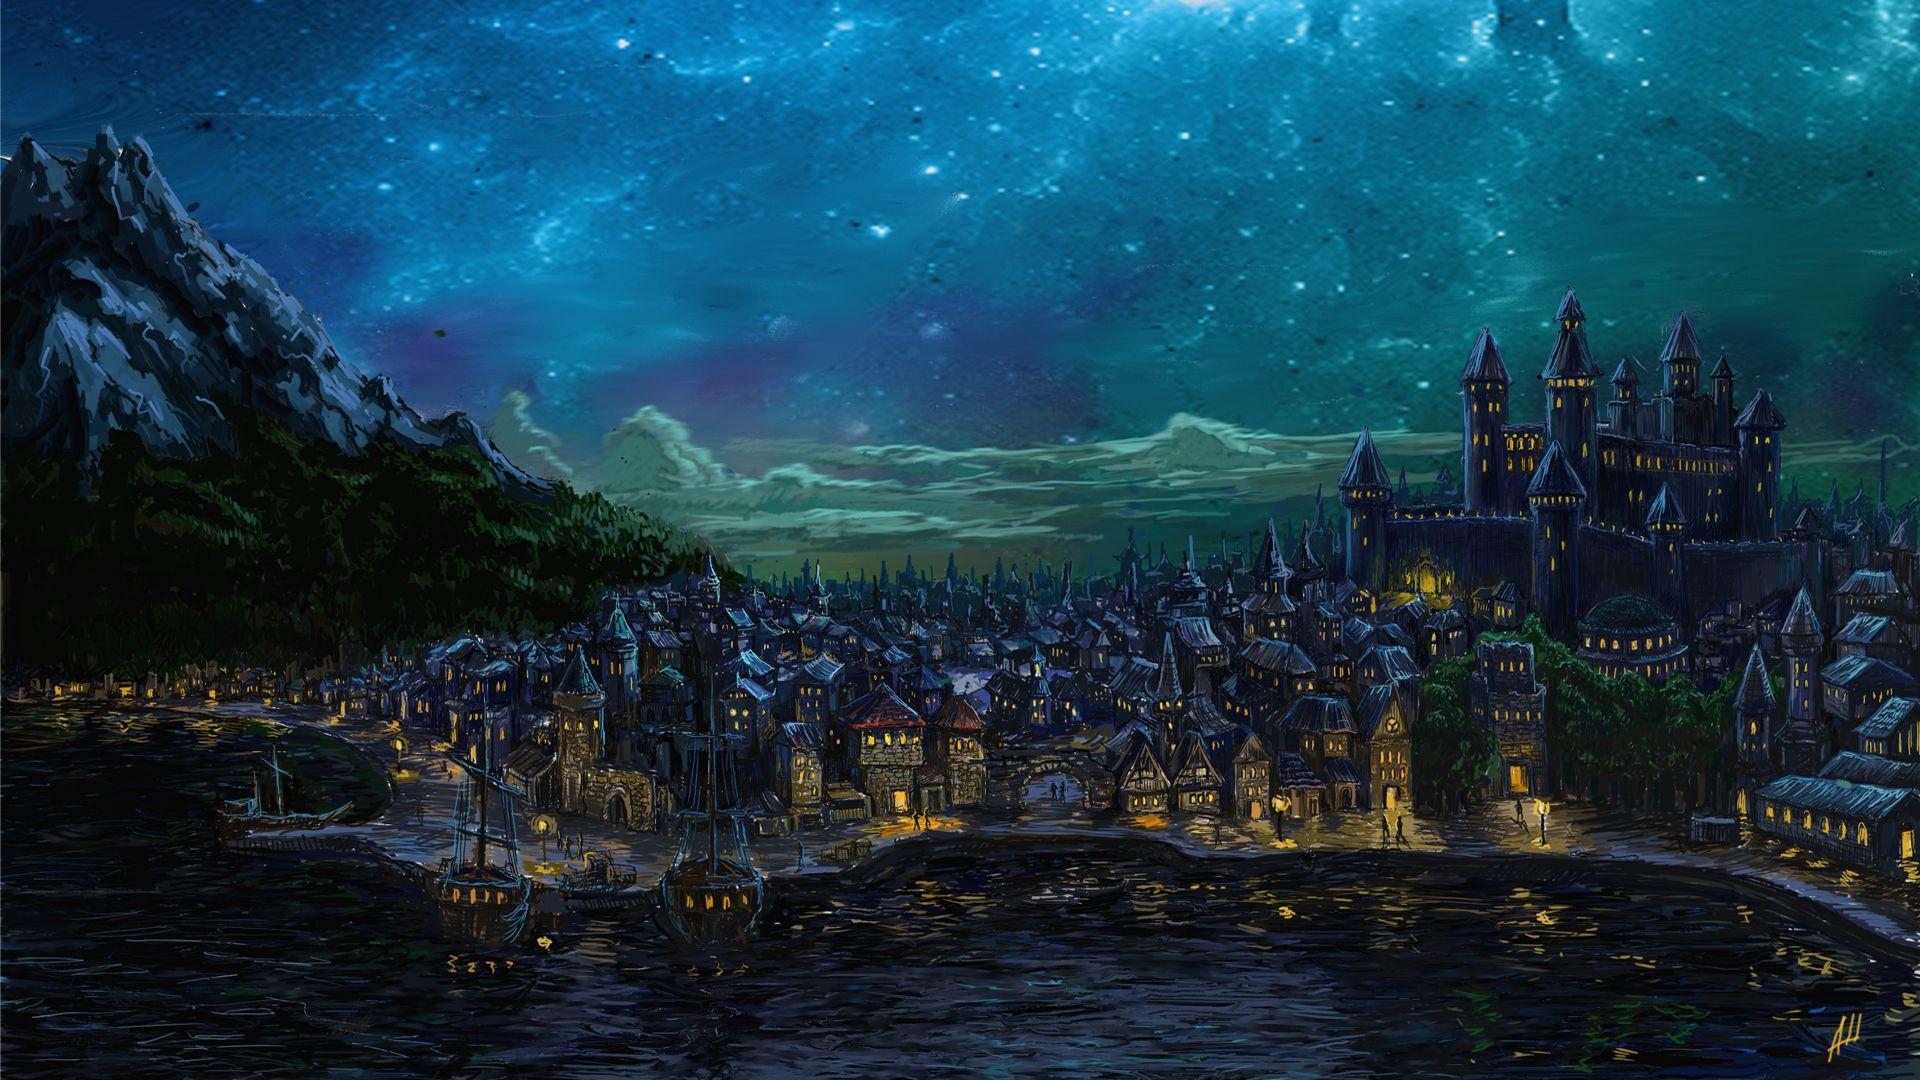 Waterdeep Wallpaper Hd Fantasy City Fantasy Landscape Dark City